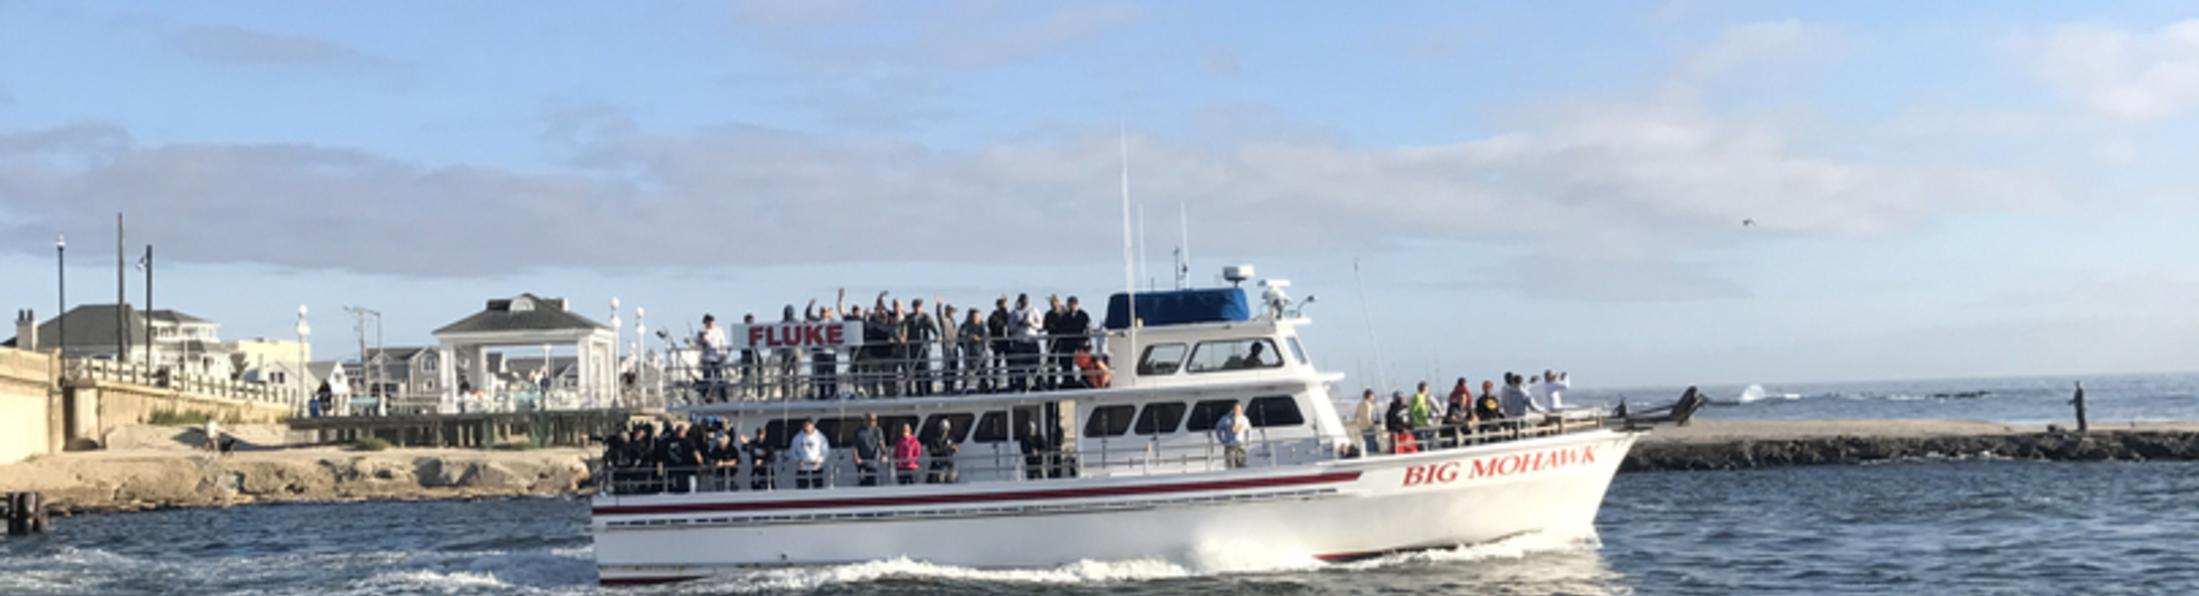 Home big mohawk south belmar nj for Big mohawk fishing boat